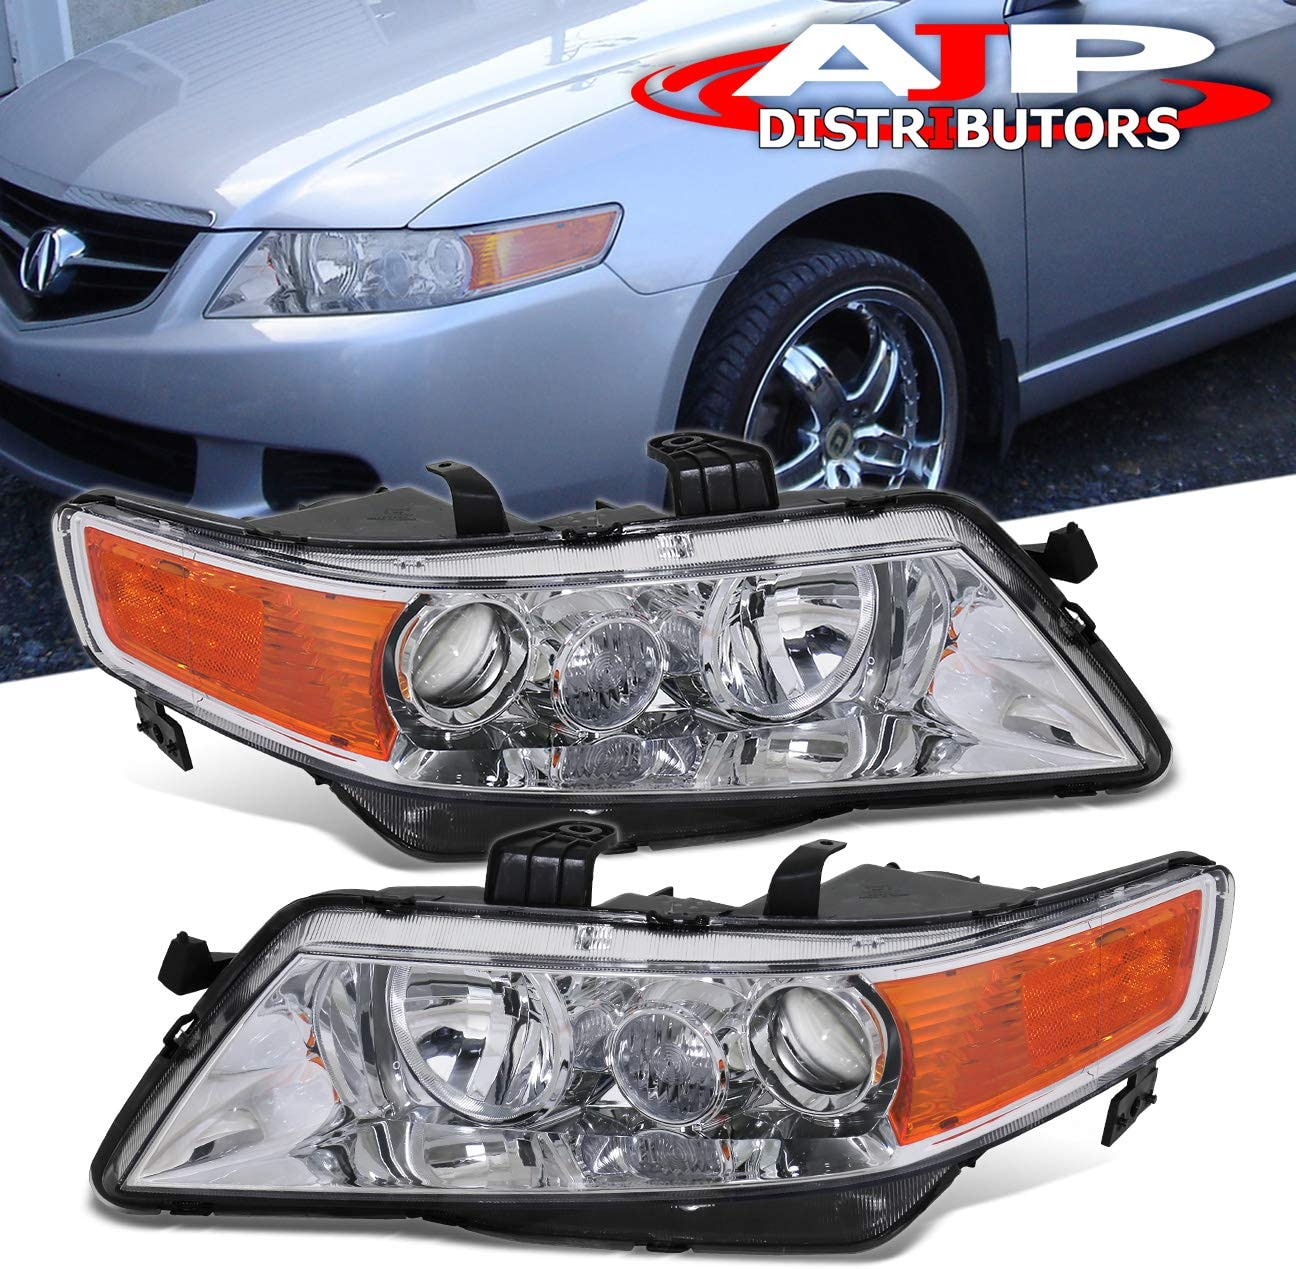 AJP Distributors For Acura TSX Lig Head お得なキャンペーンを実施中 CL9 Headlights Projector 大人気